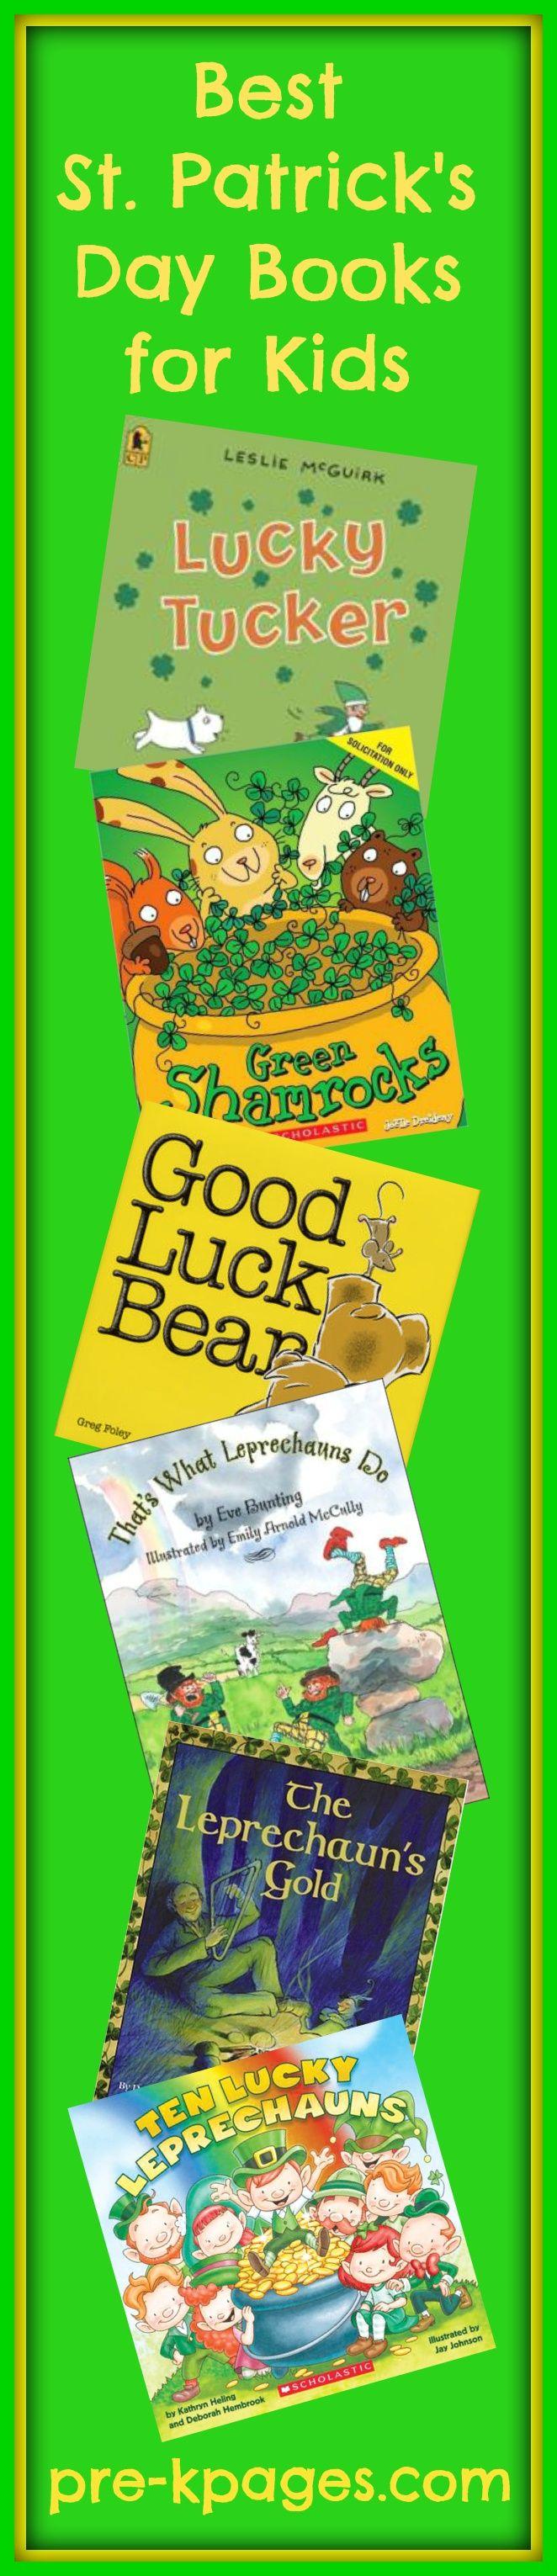 Best St. Patrick's Day Books for Preschool and Kindergarten.